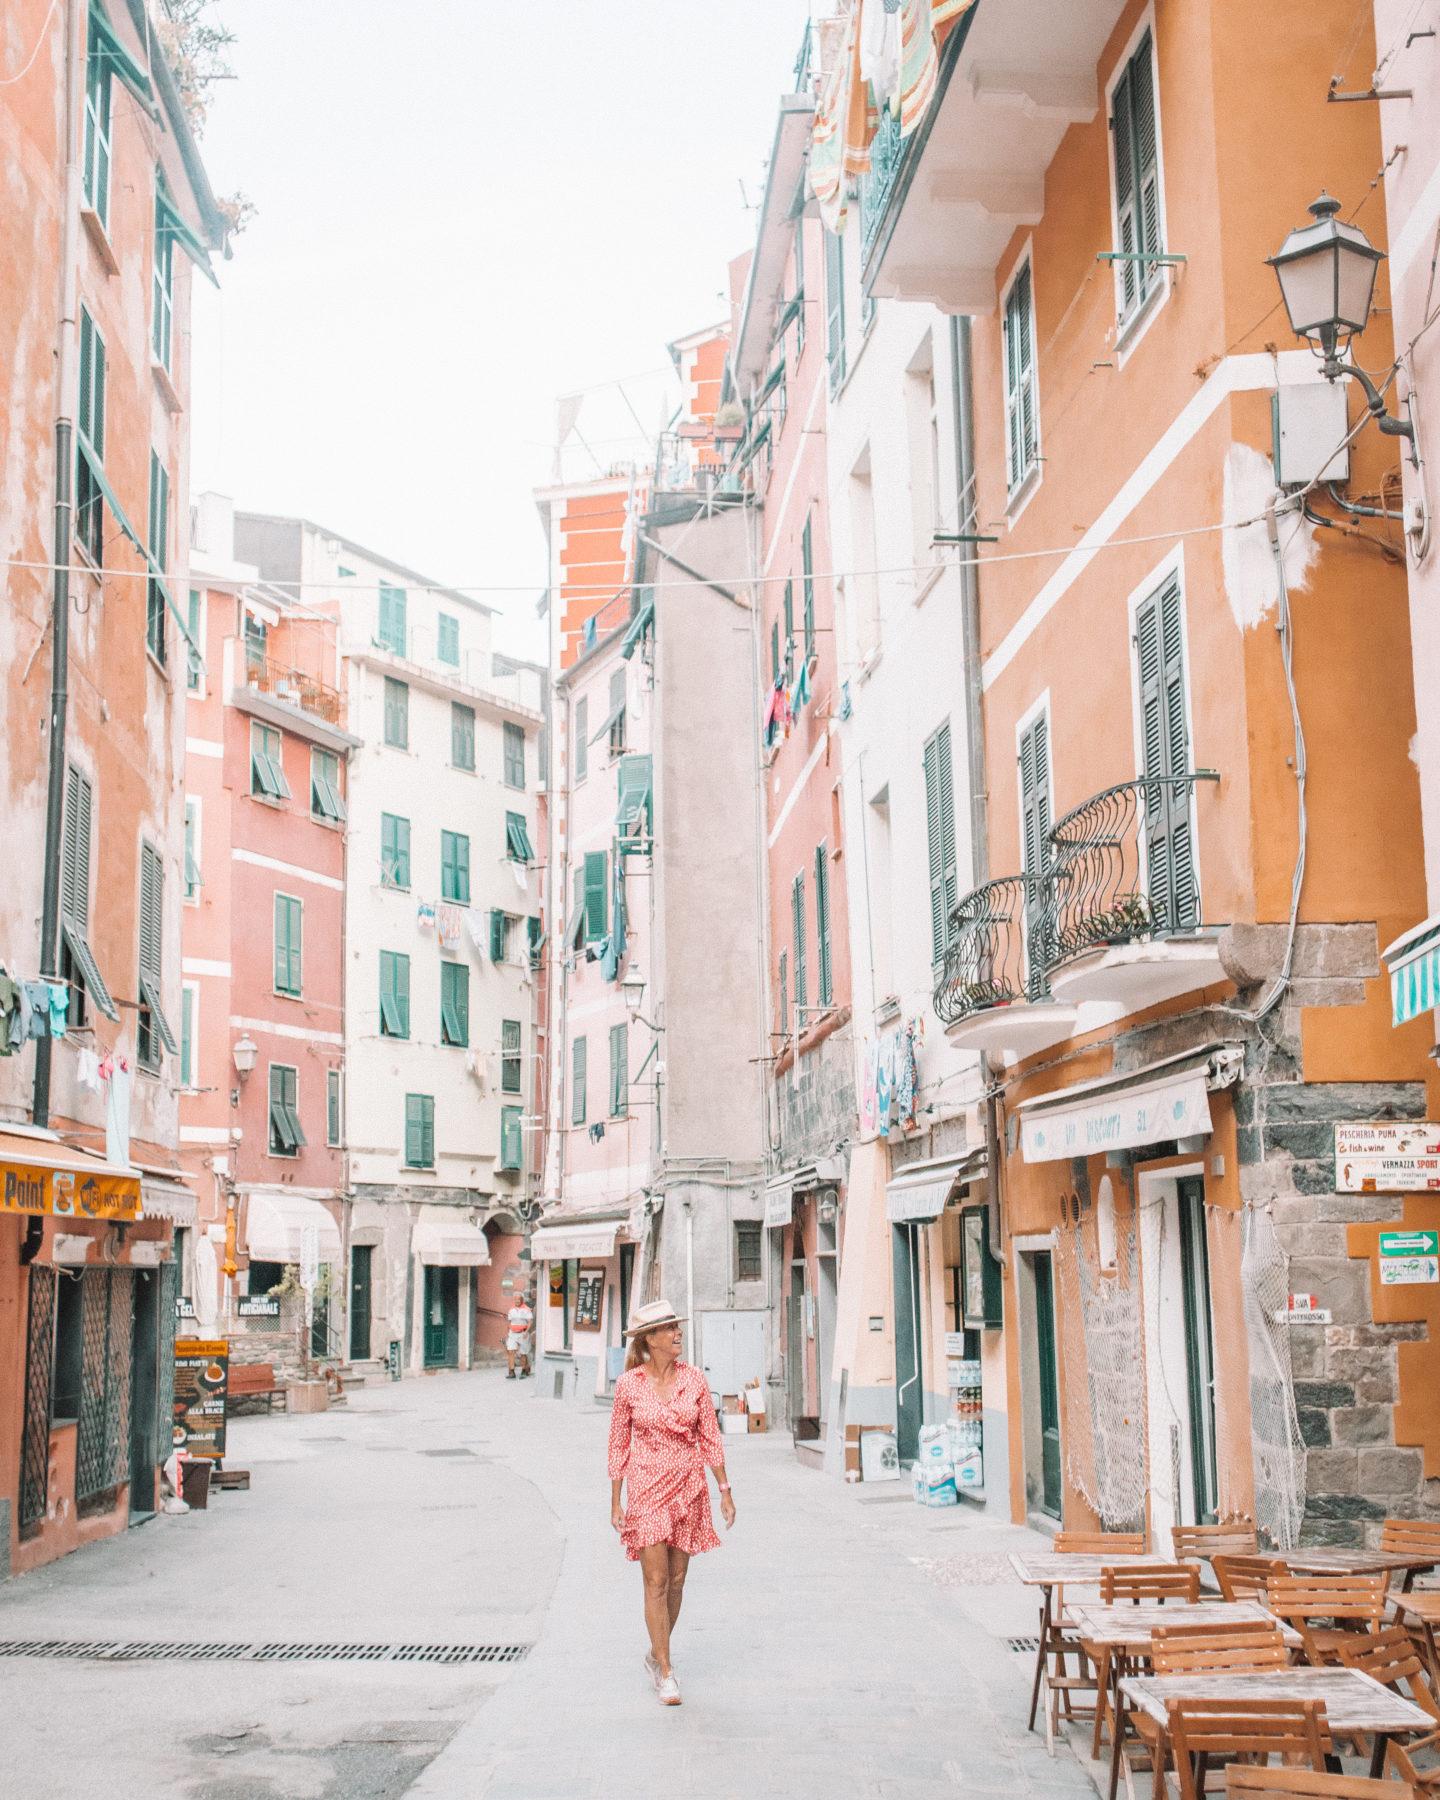 The Heart Of Cinque Terre cinque terre, you stole my heart! - kattis lundin